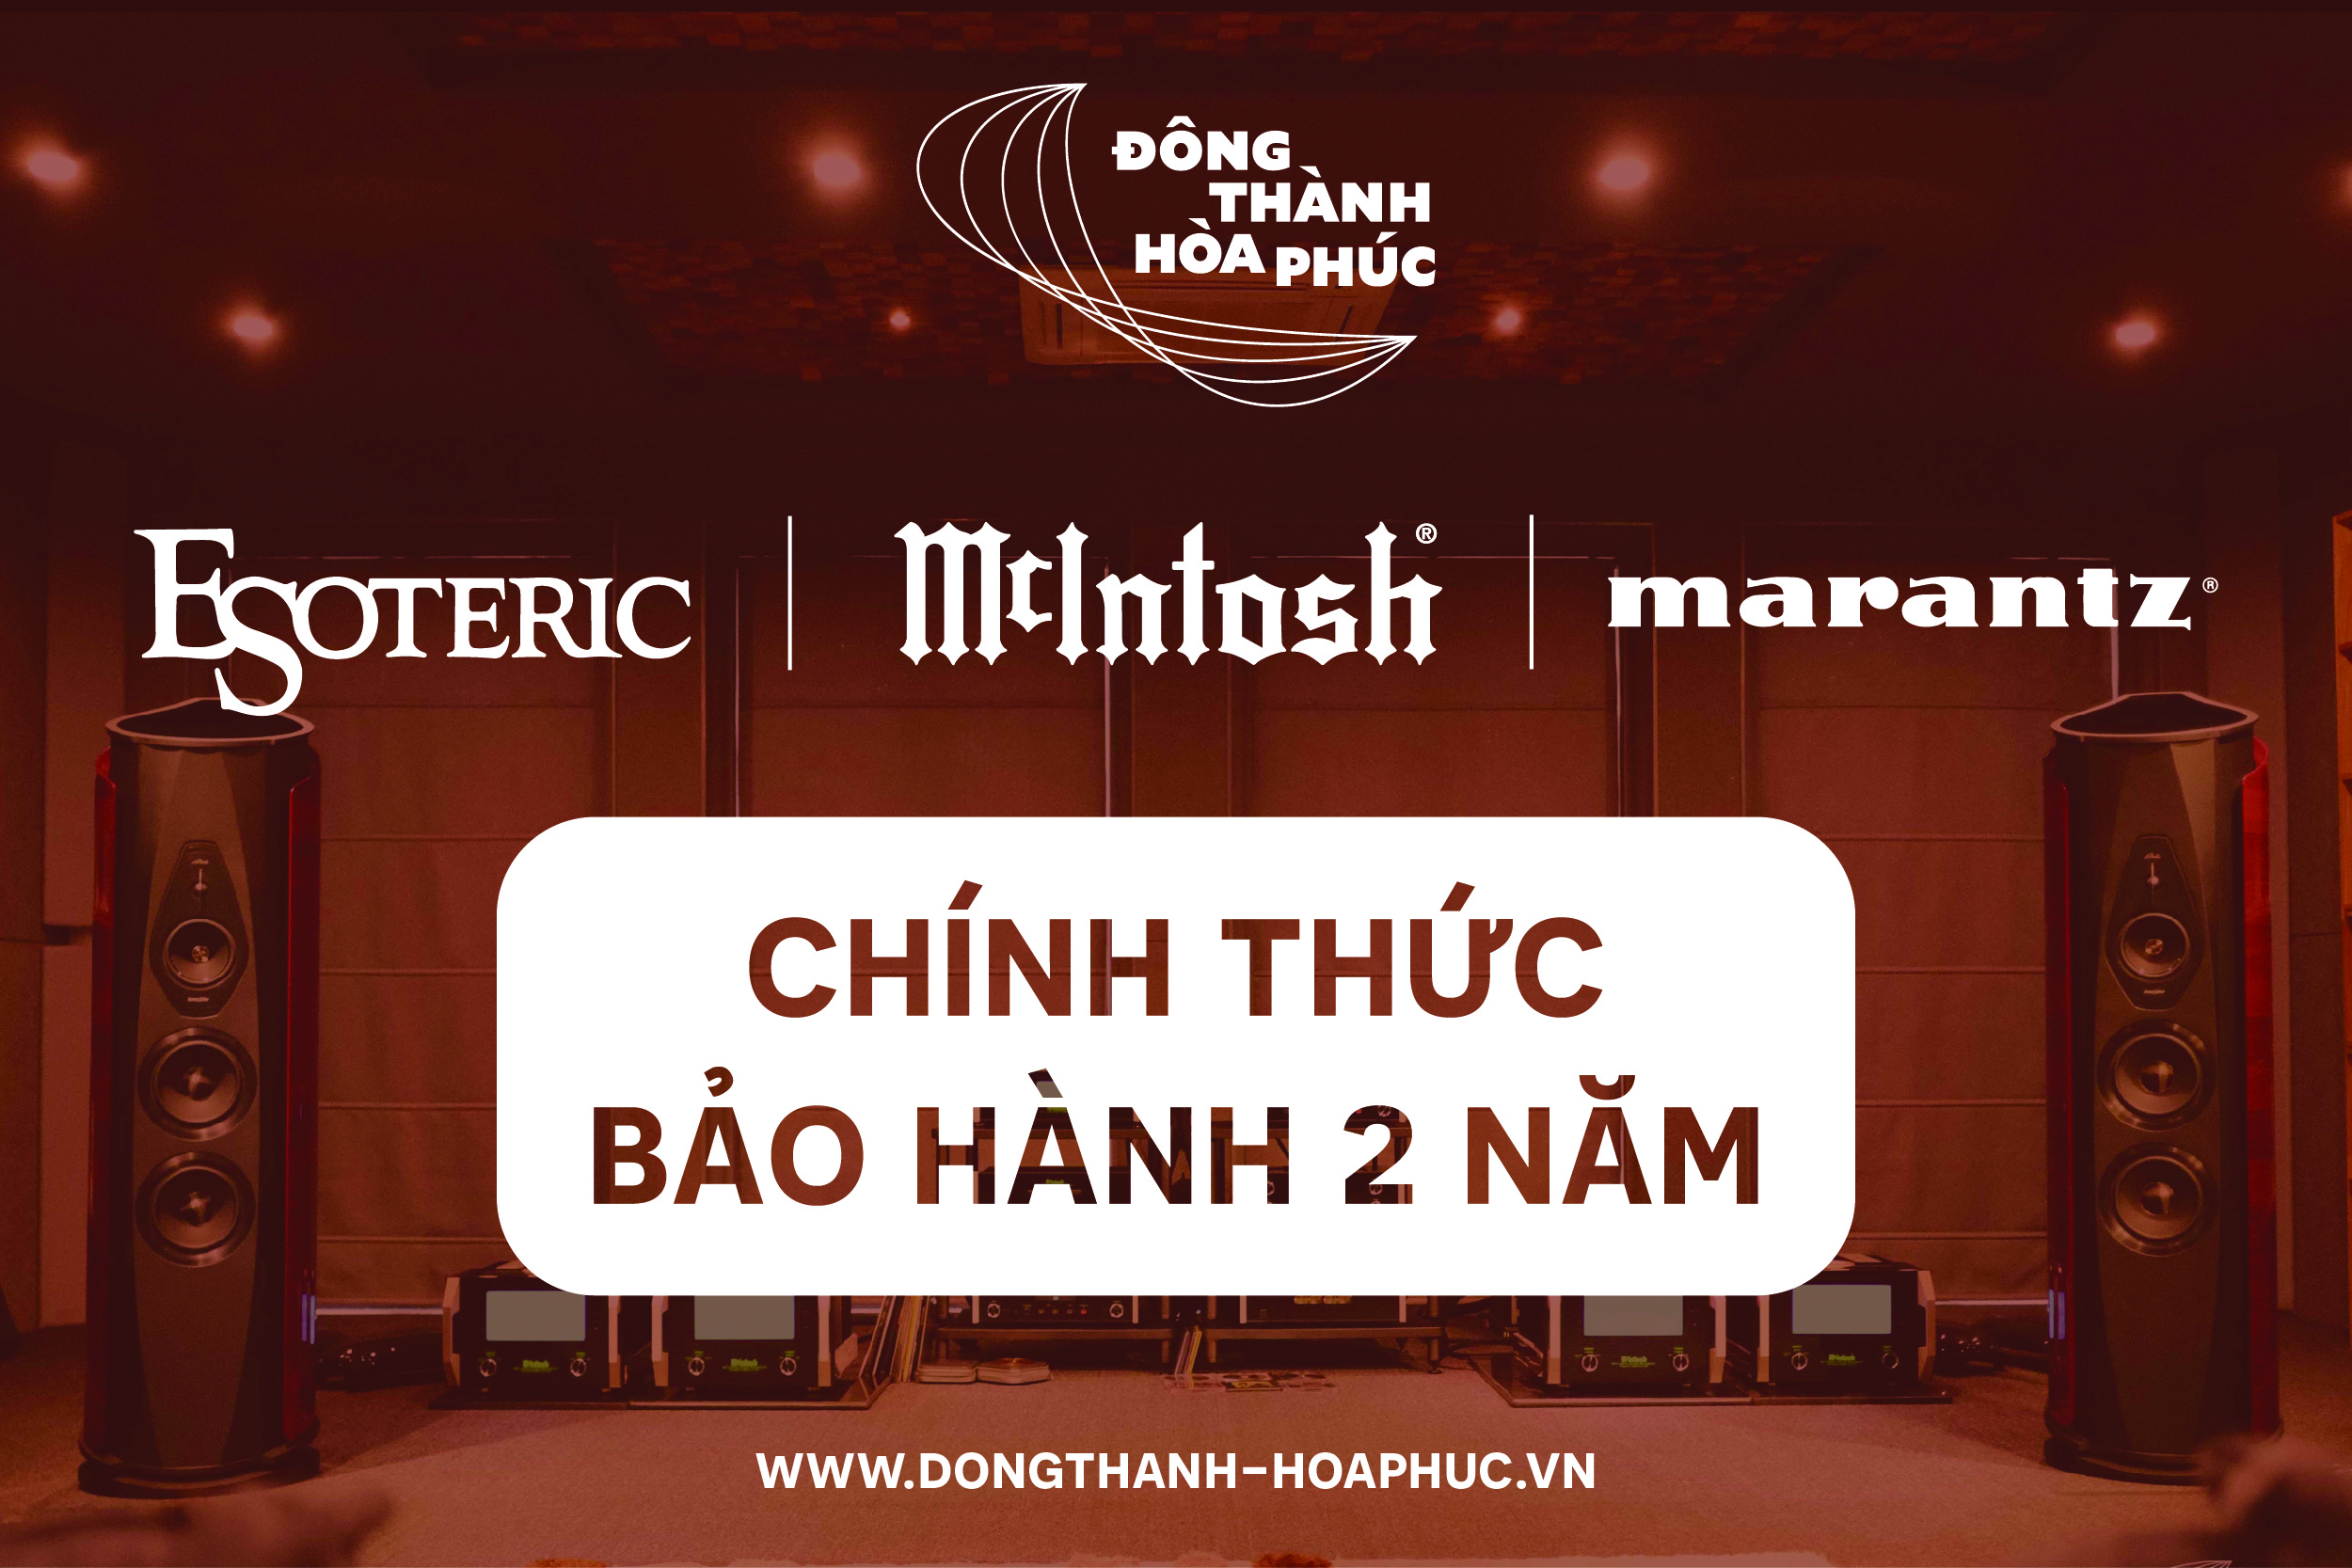 DongThanhHoaPhuc-McIntosh_Marantz-Esoteric-bao hanh 2 nam-01.jpg